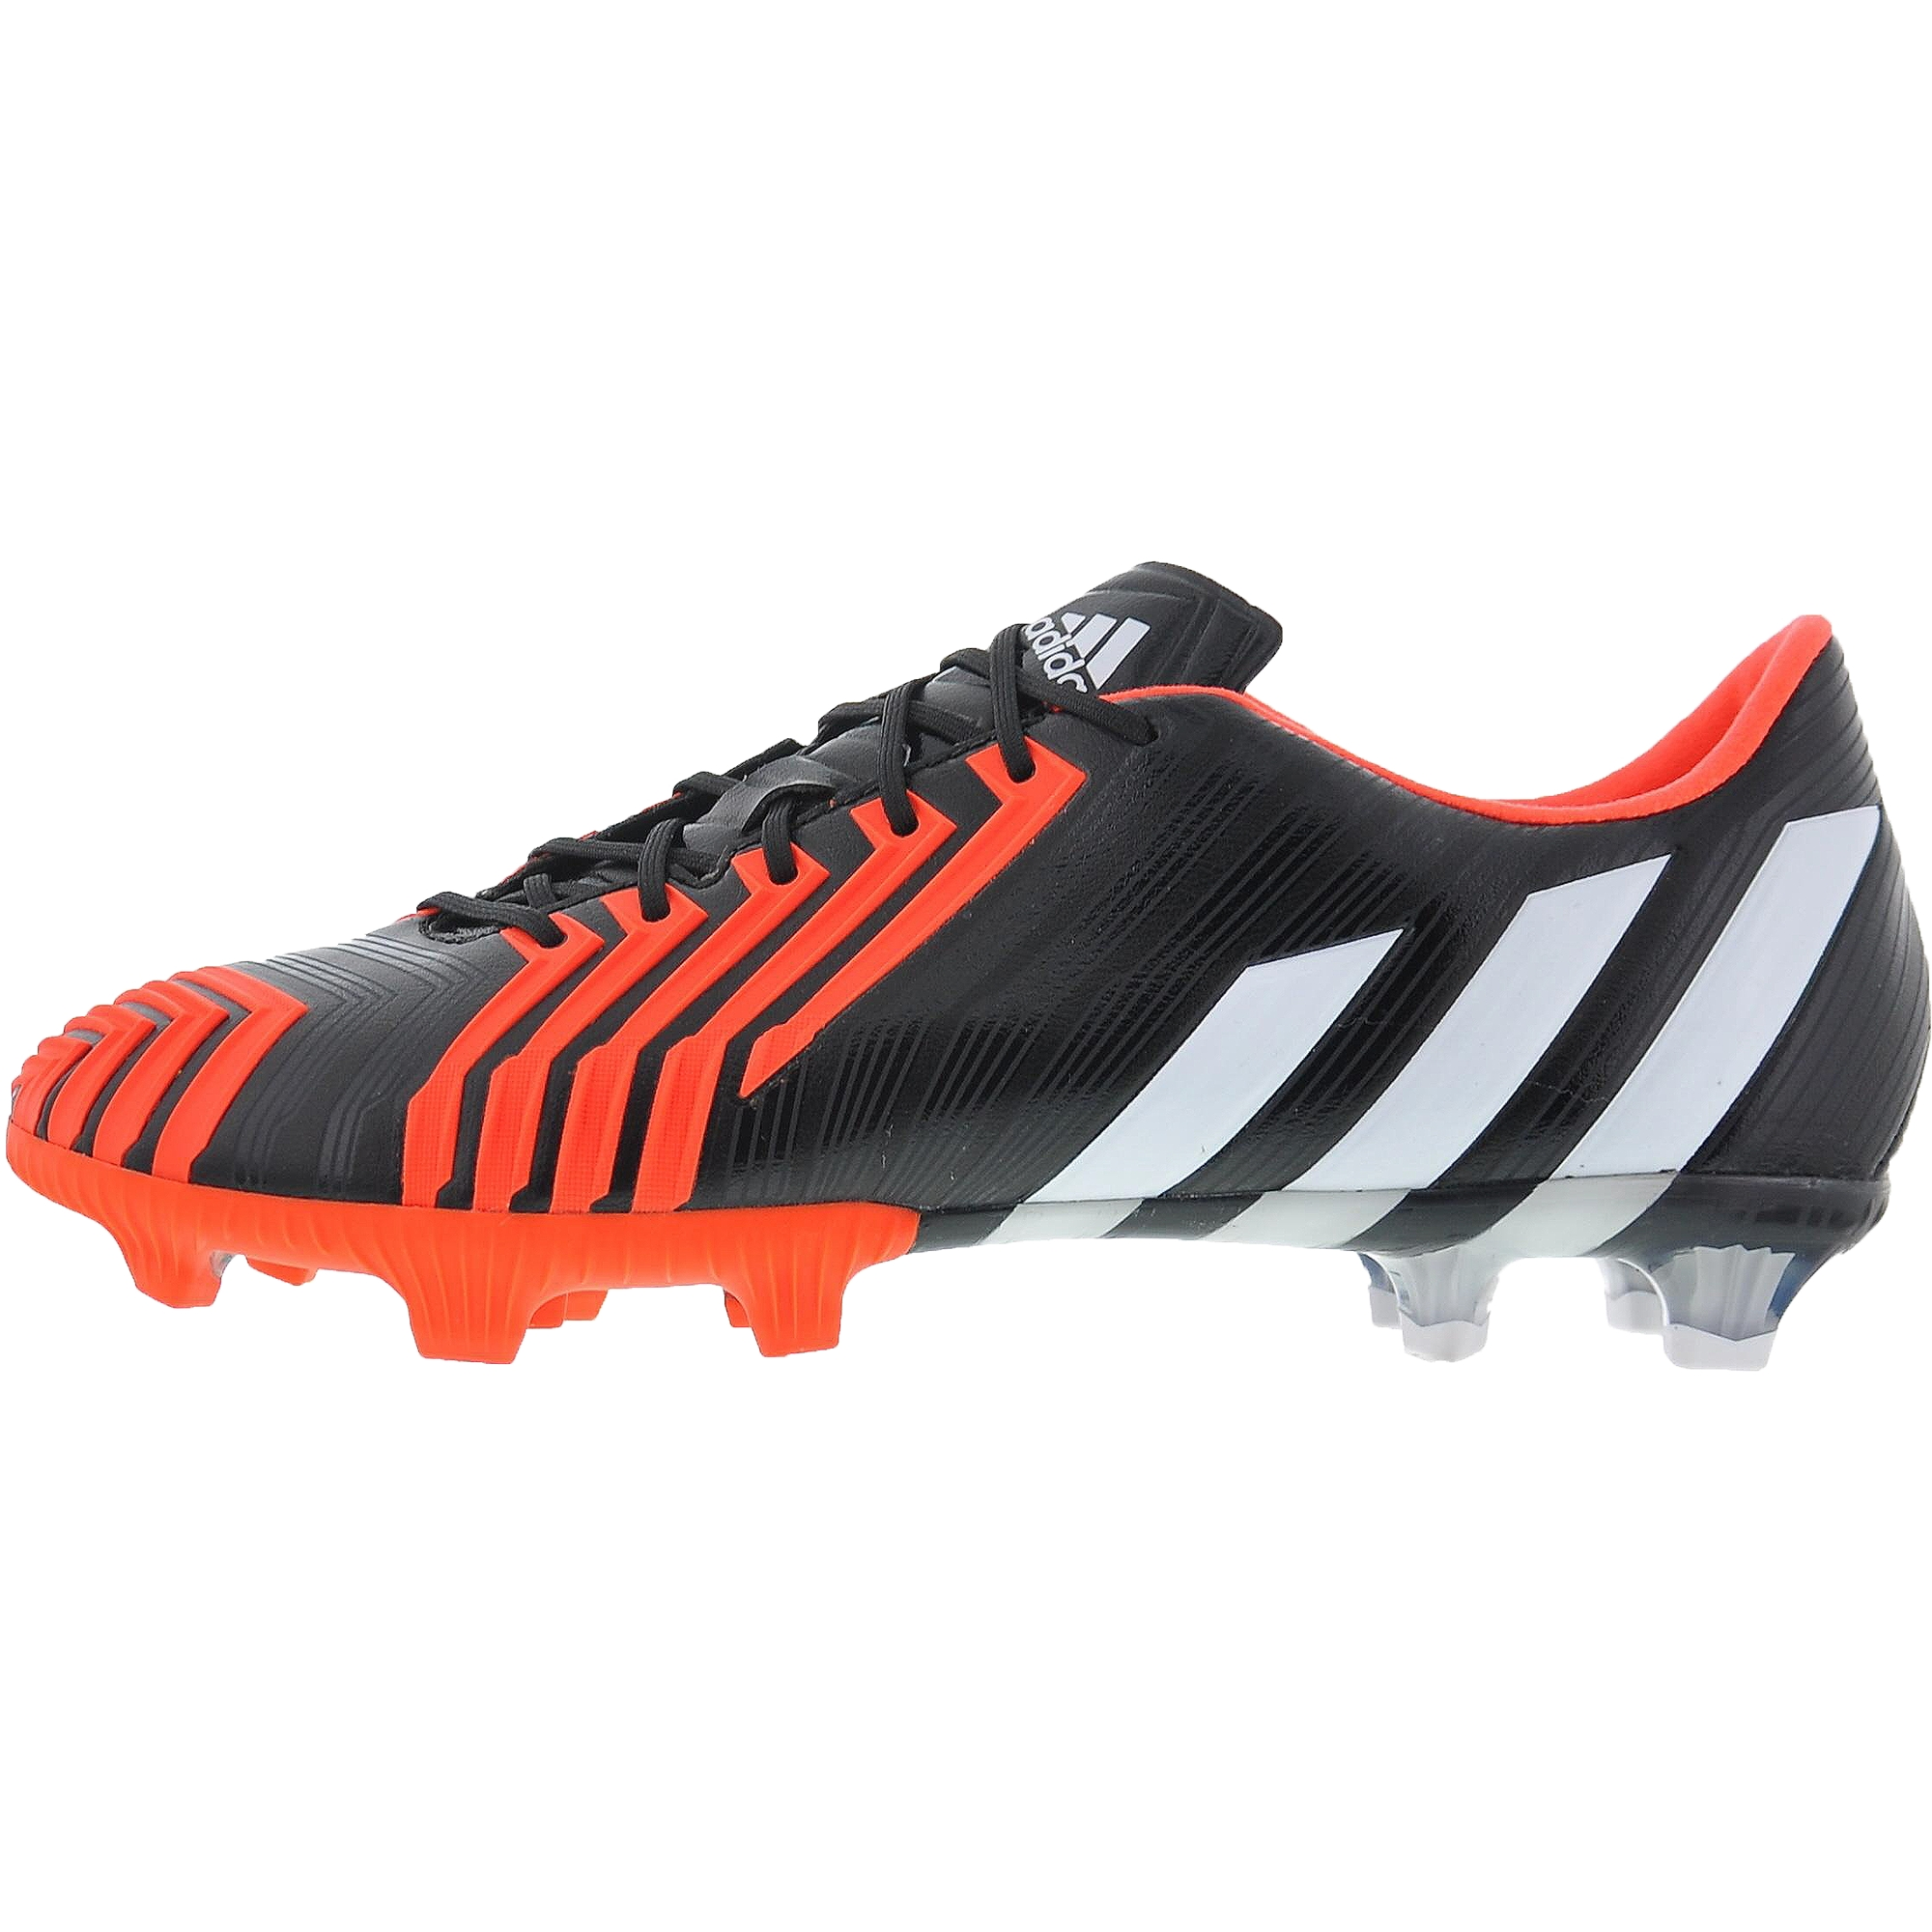 89fd88c153061 ... best price adidas predator instinct ss15 fg krampon a18dd 1b9d7